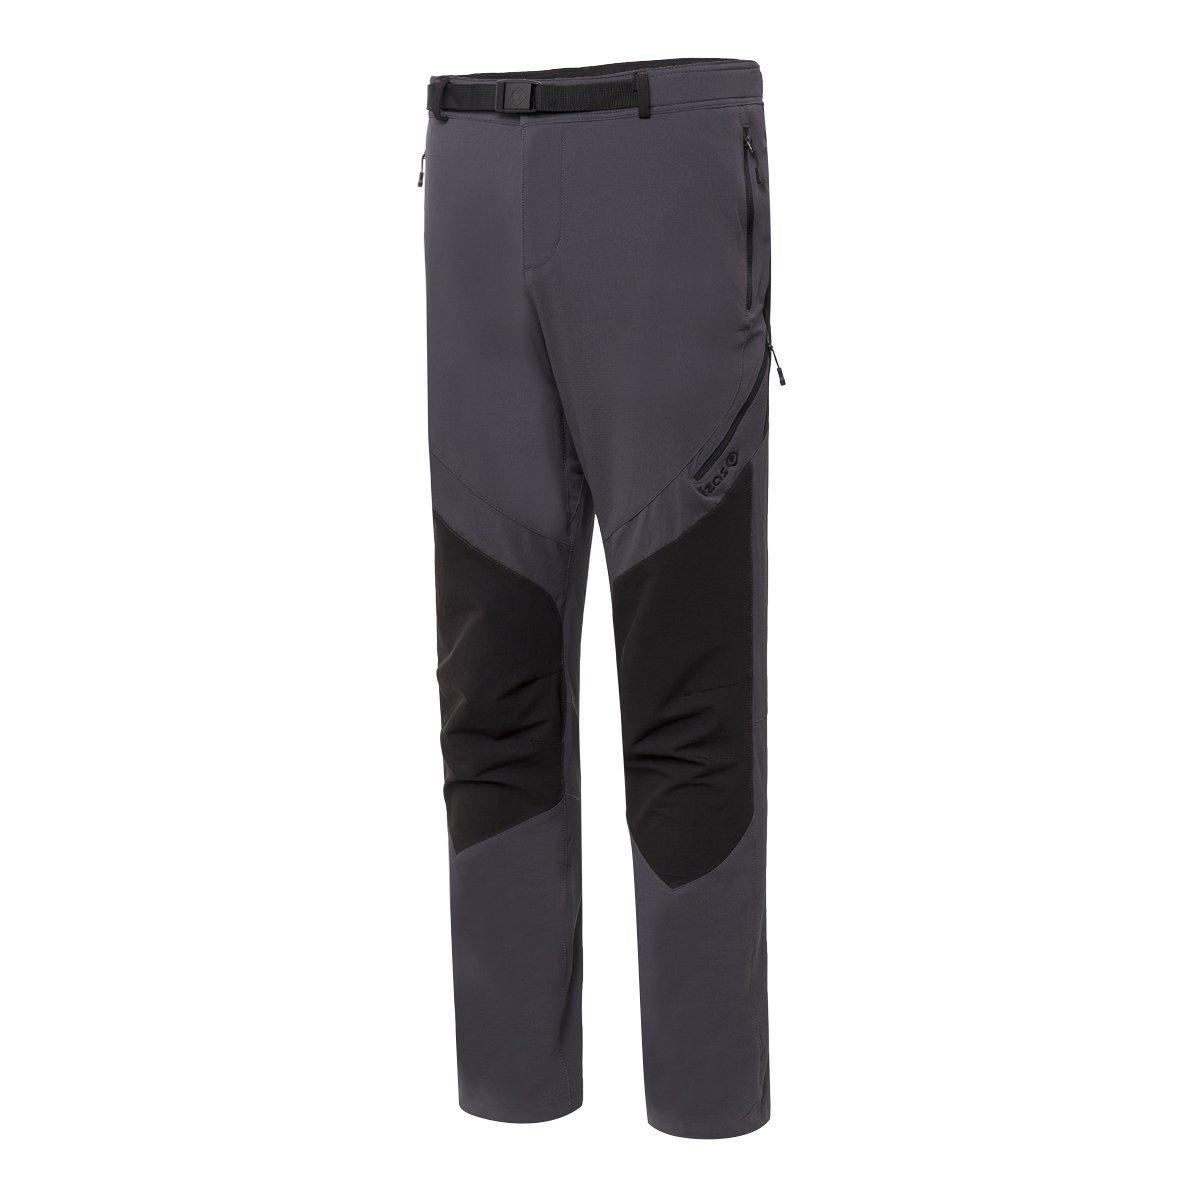 Hombre Izas Ilde Pantalones Mount-Stretch